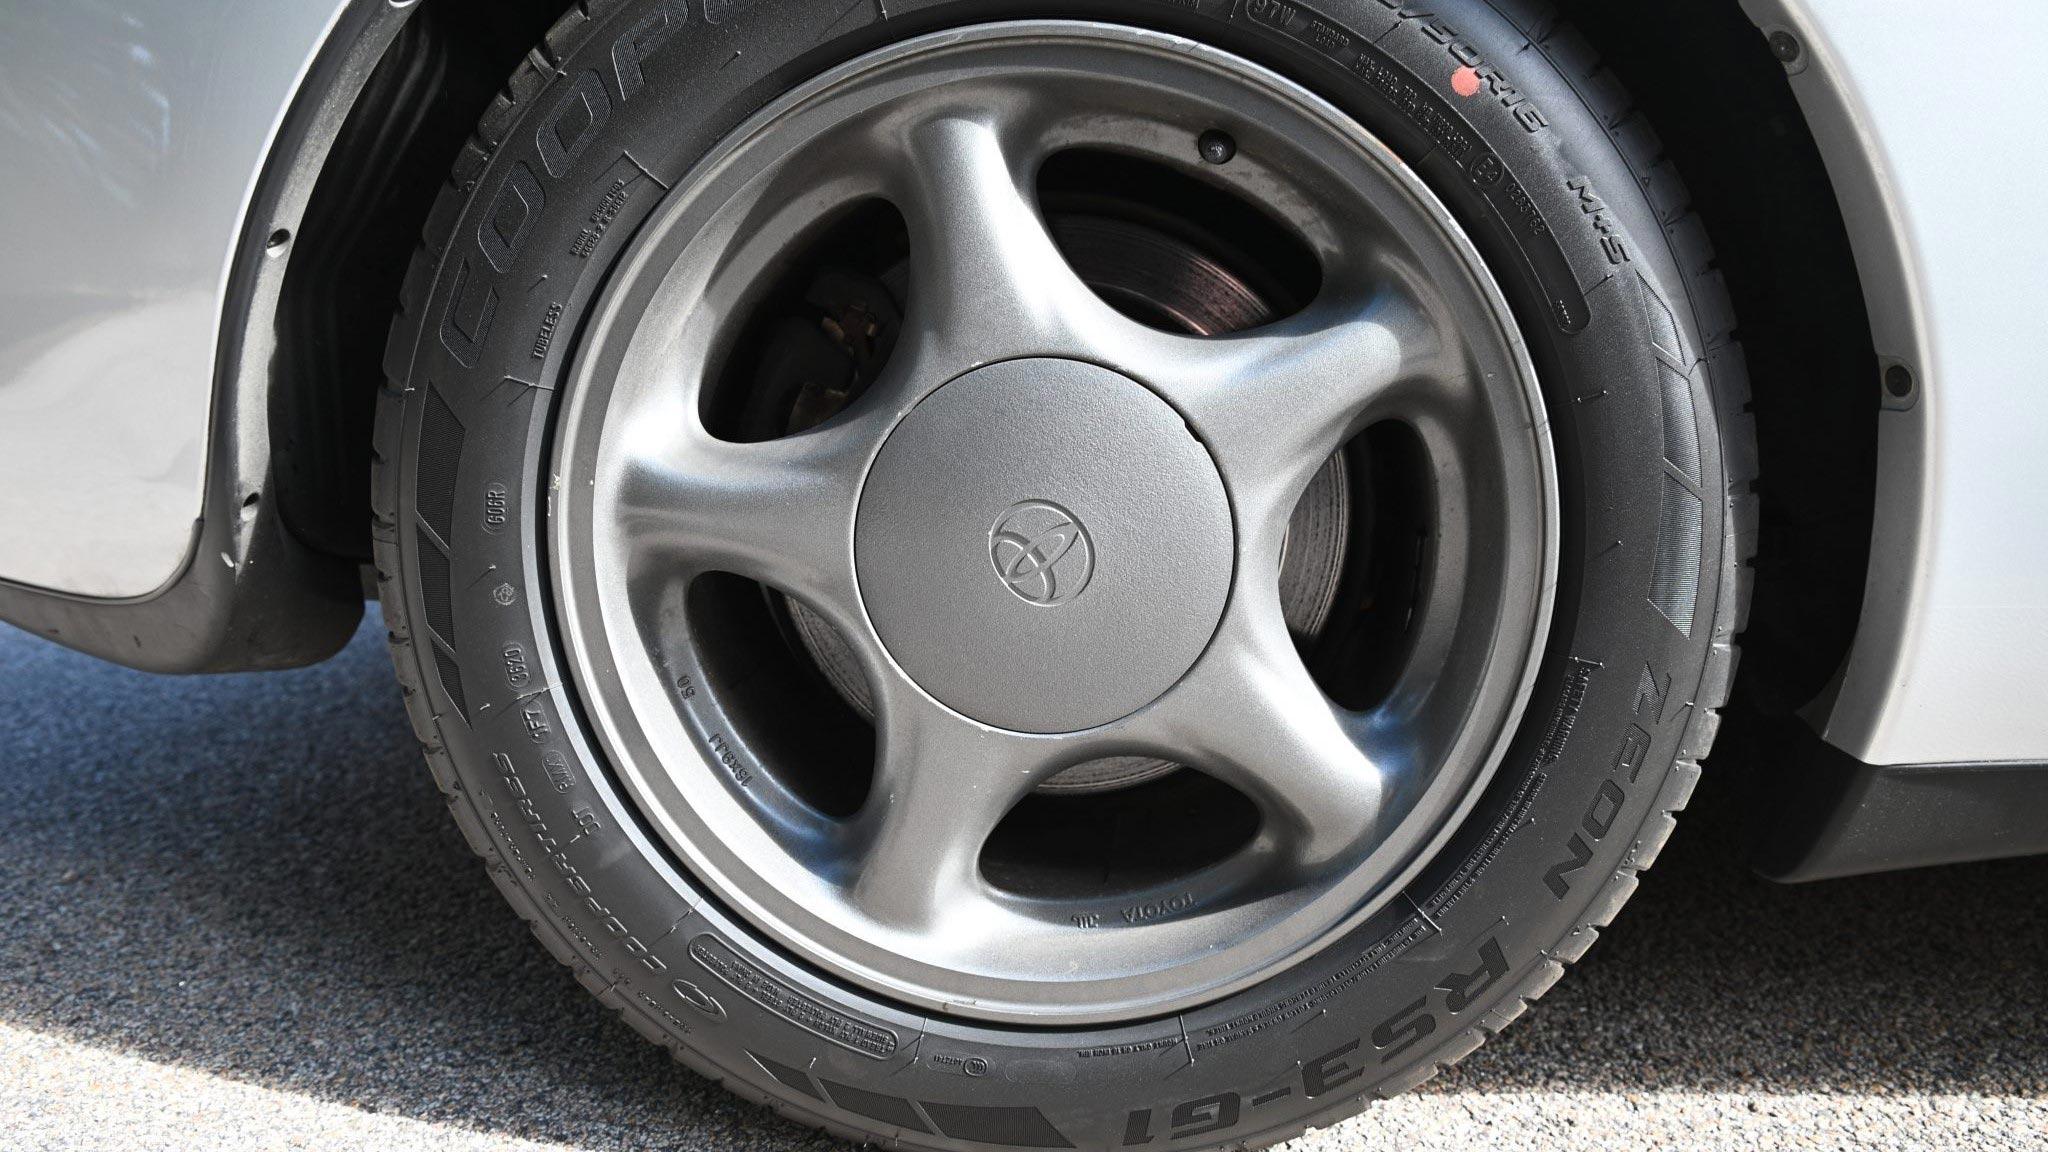 The Toyota RZ Front Wheel